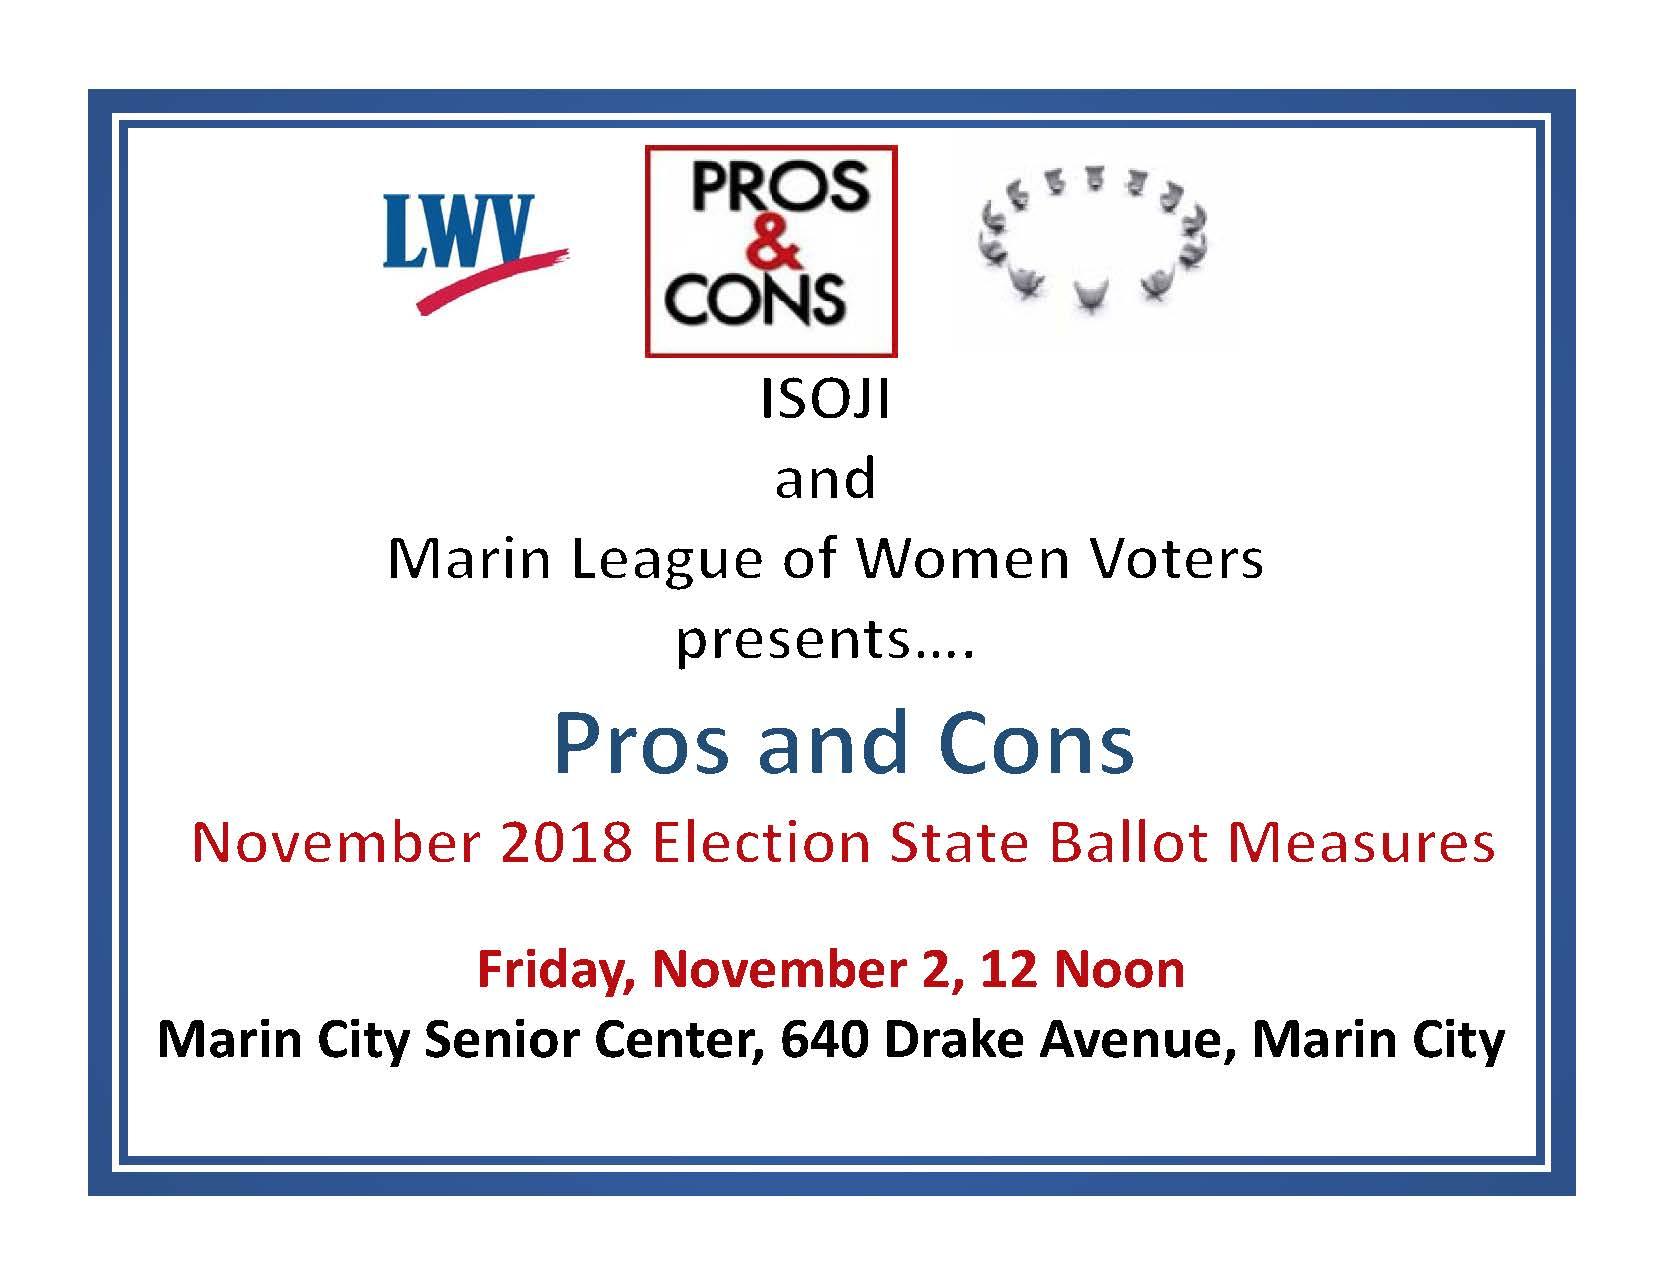 181102-Marin City ISOJI Pros and Cons presentation.jpg